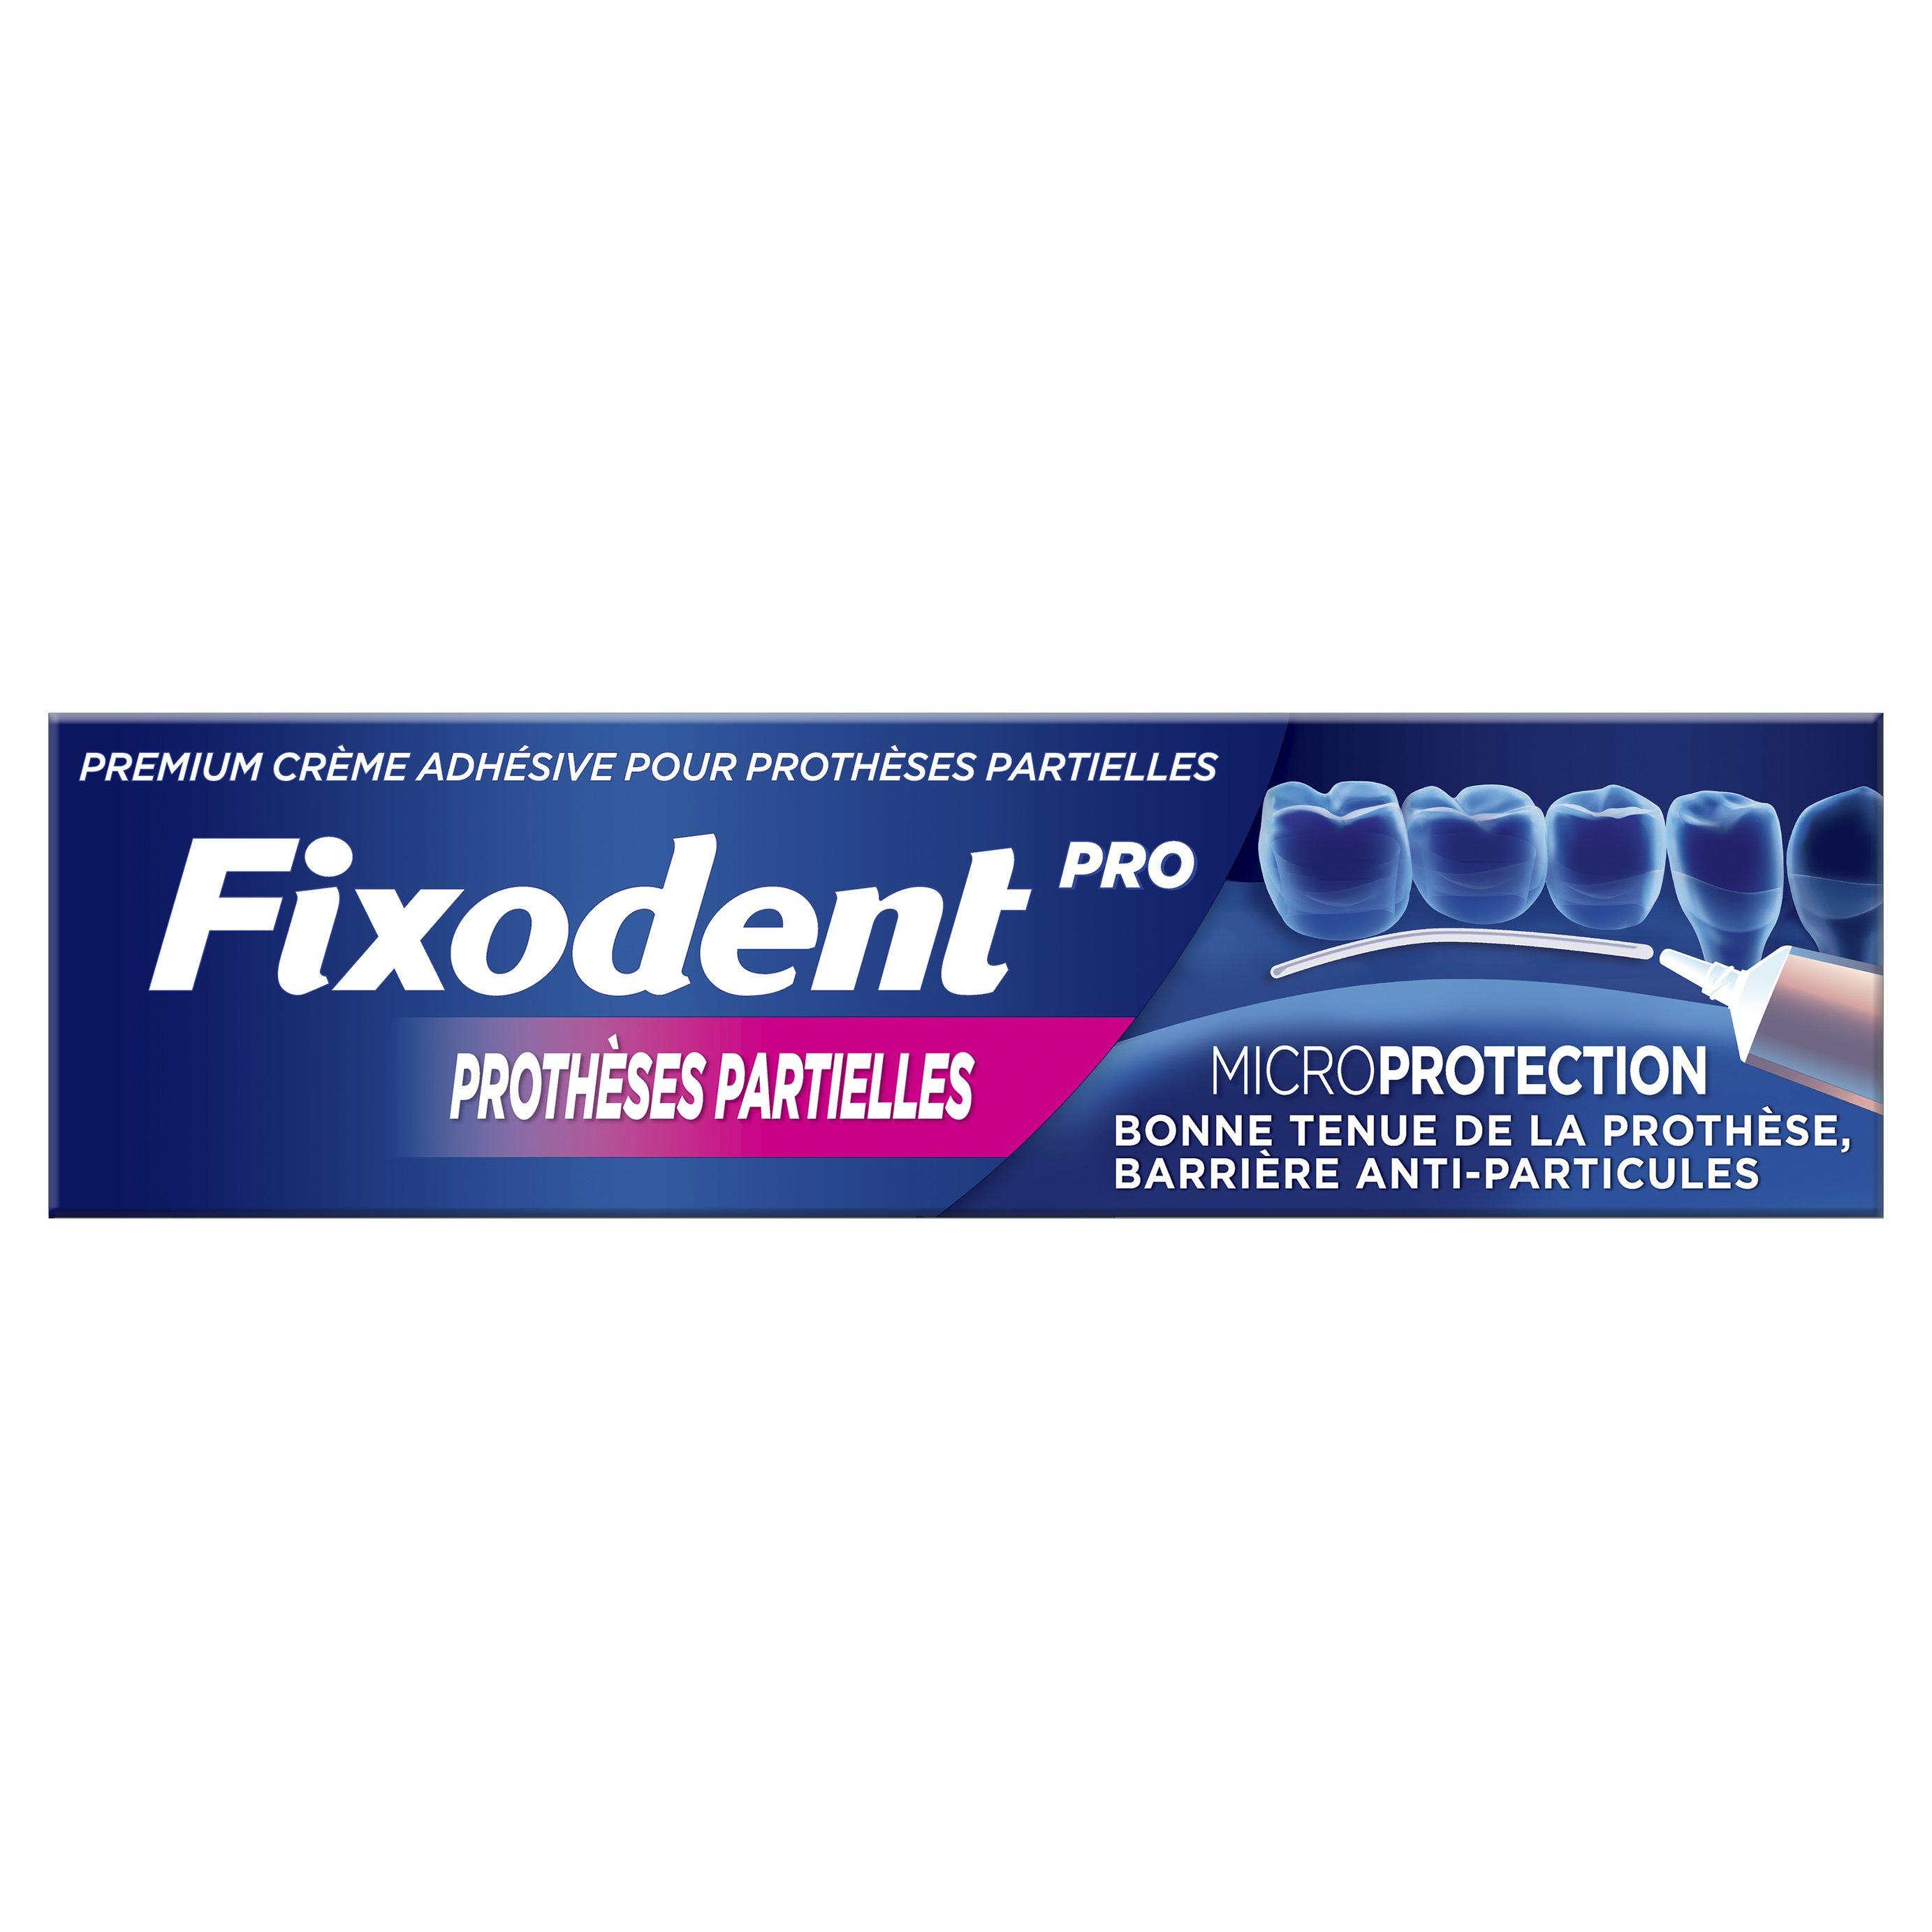 Fixodent Pro Micro Protection Micro Seal Στερεωτική Κρέμα για Μερική Τεχνητή Οδοντοστοιχία 40g